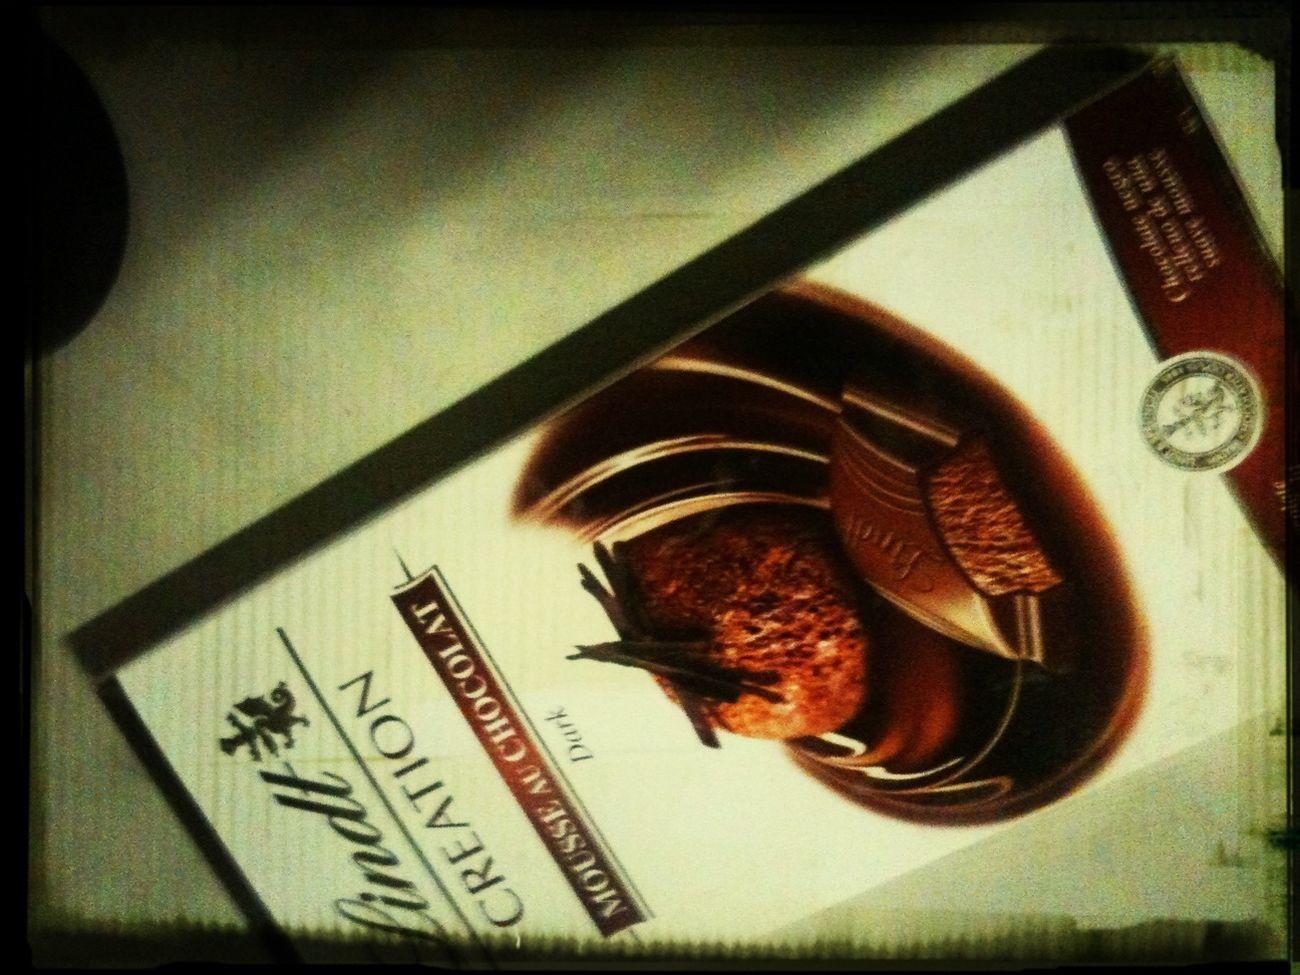 Esse sim é gostoso!! this is so yummy!!! Hummm!!